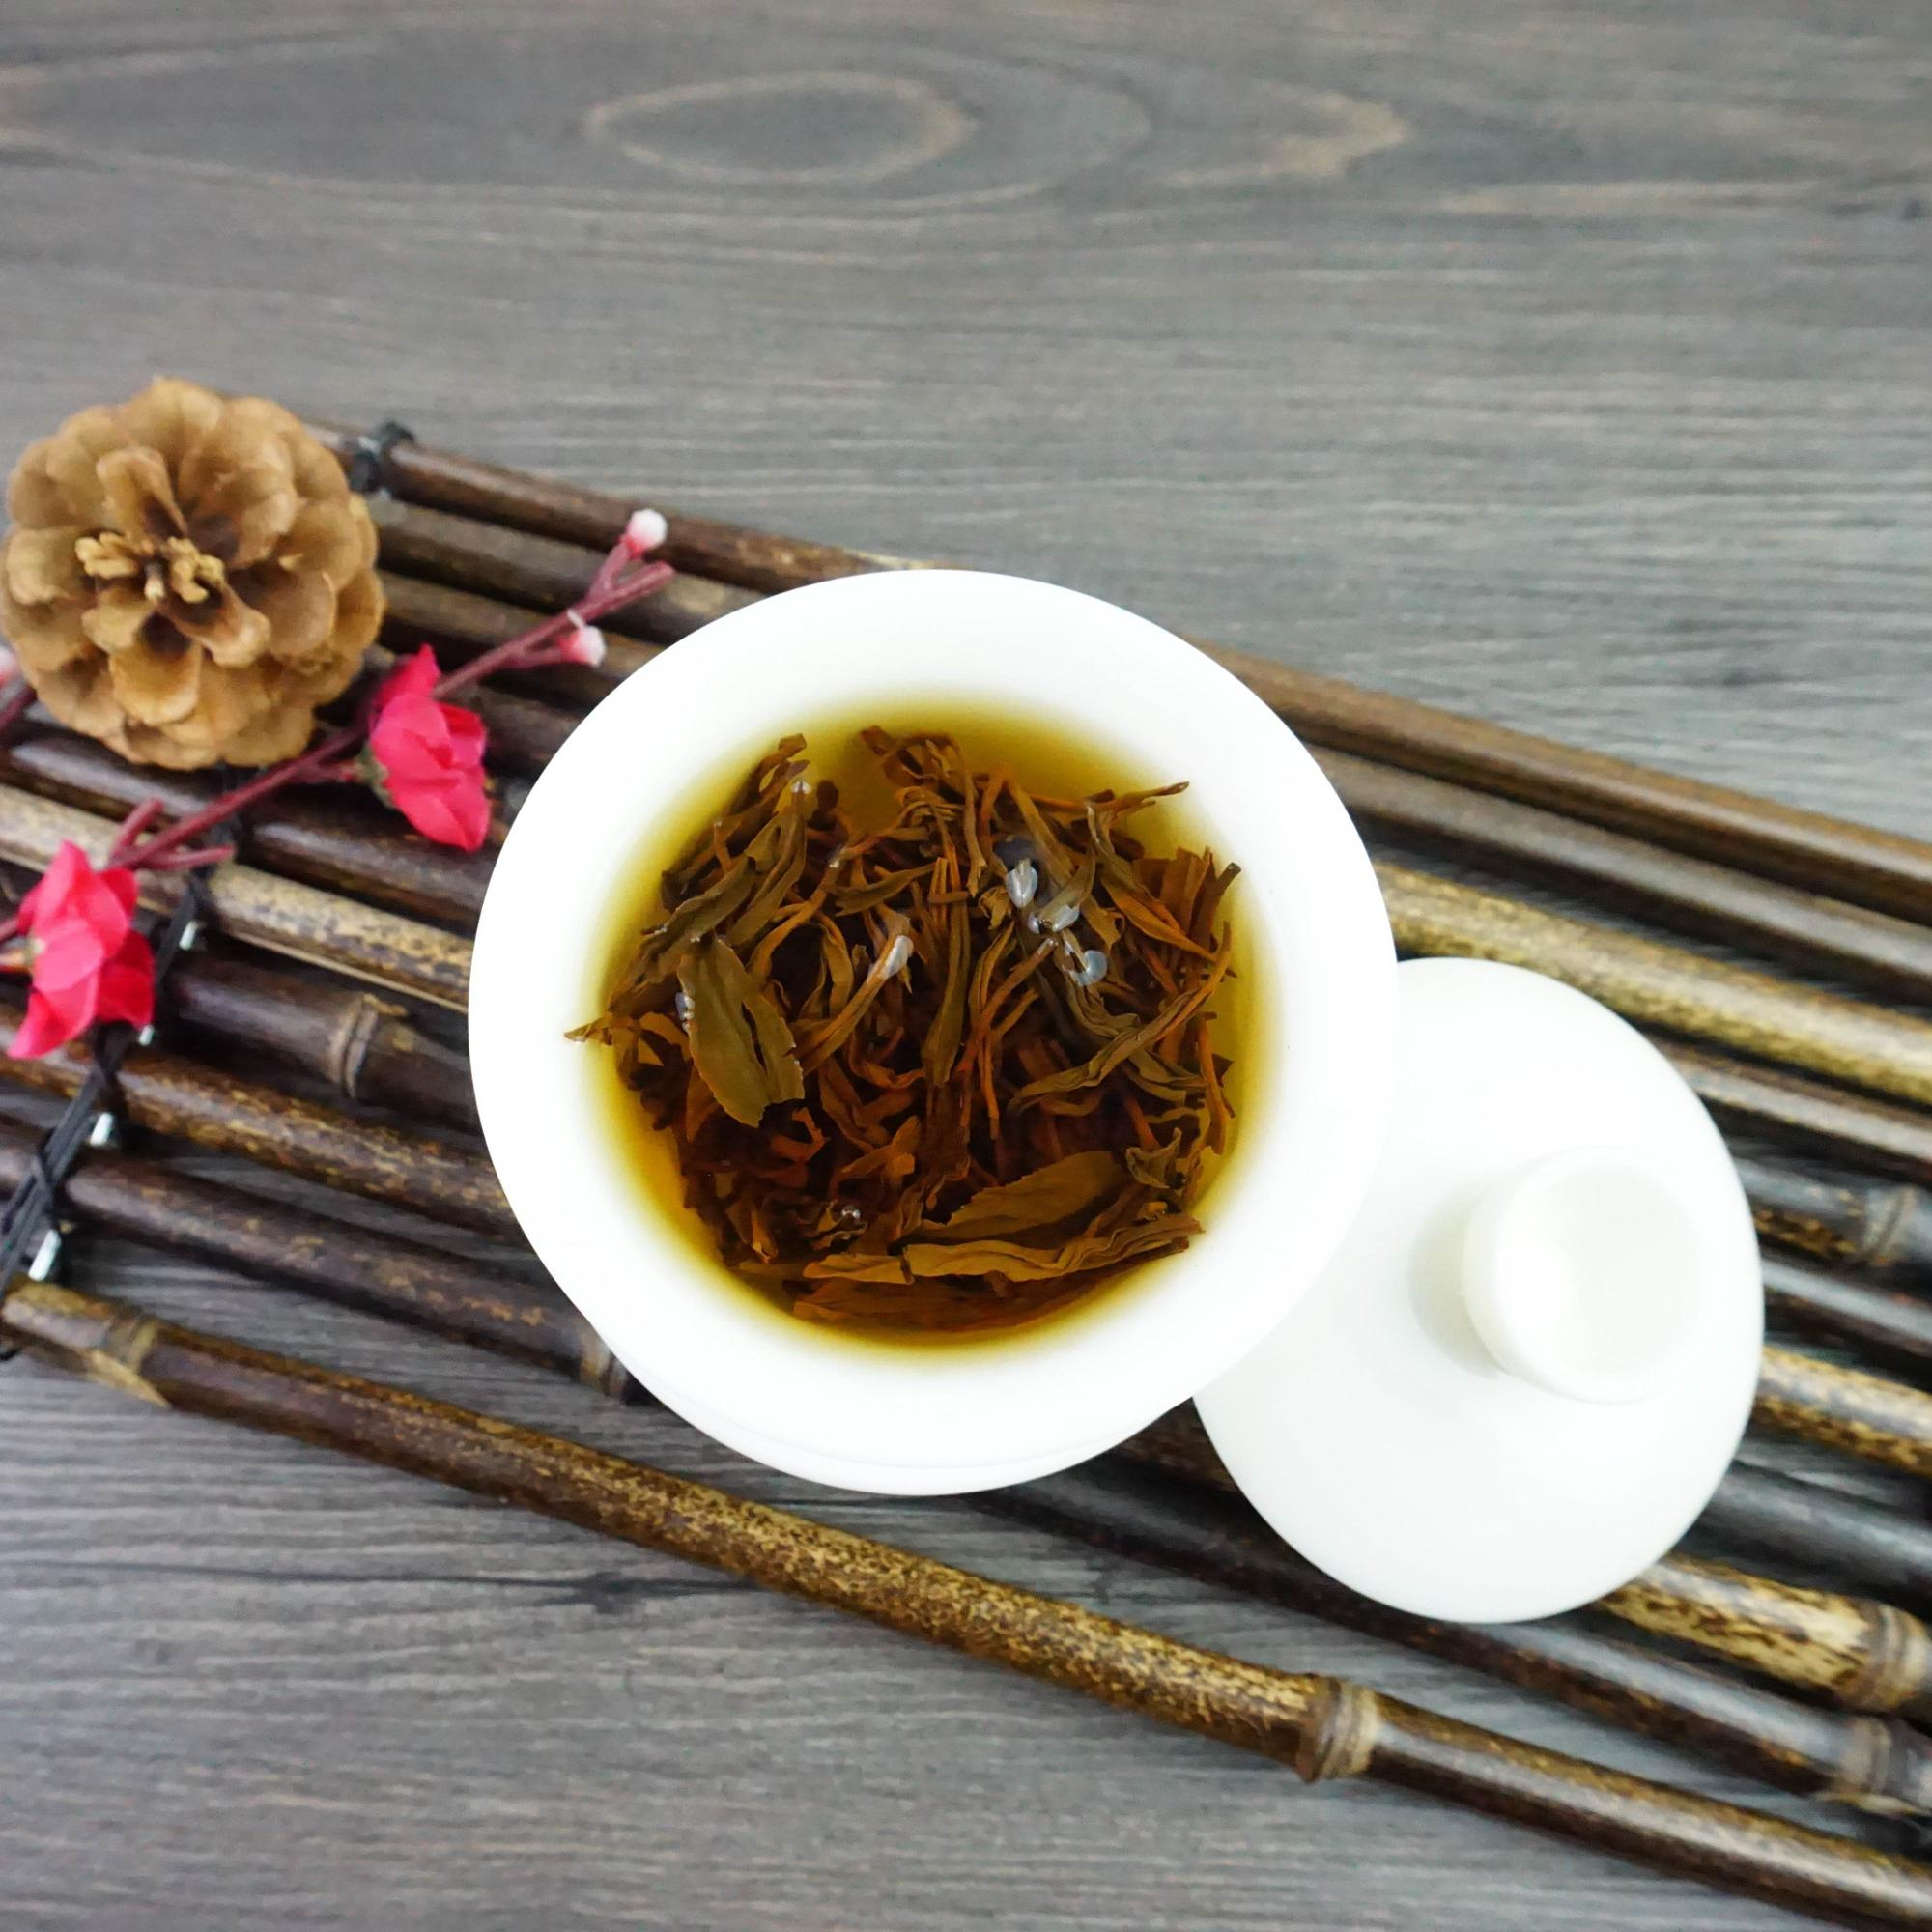 A-dragon black tea wholesale bulk black tea high mountain quality organic black tea - 4uTea | 4uTea.com